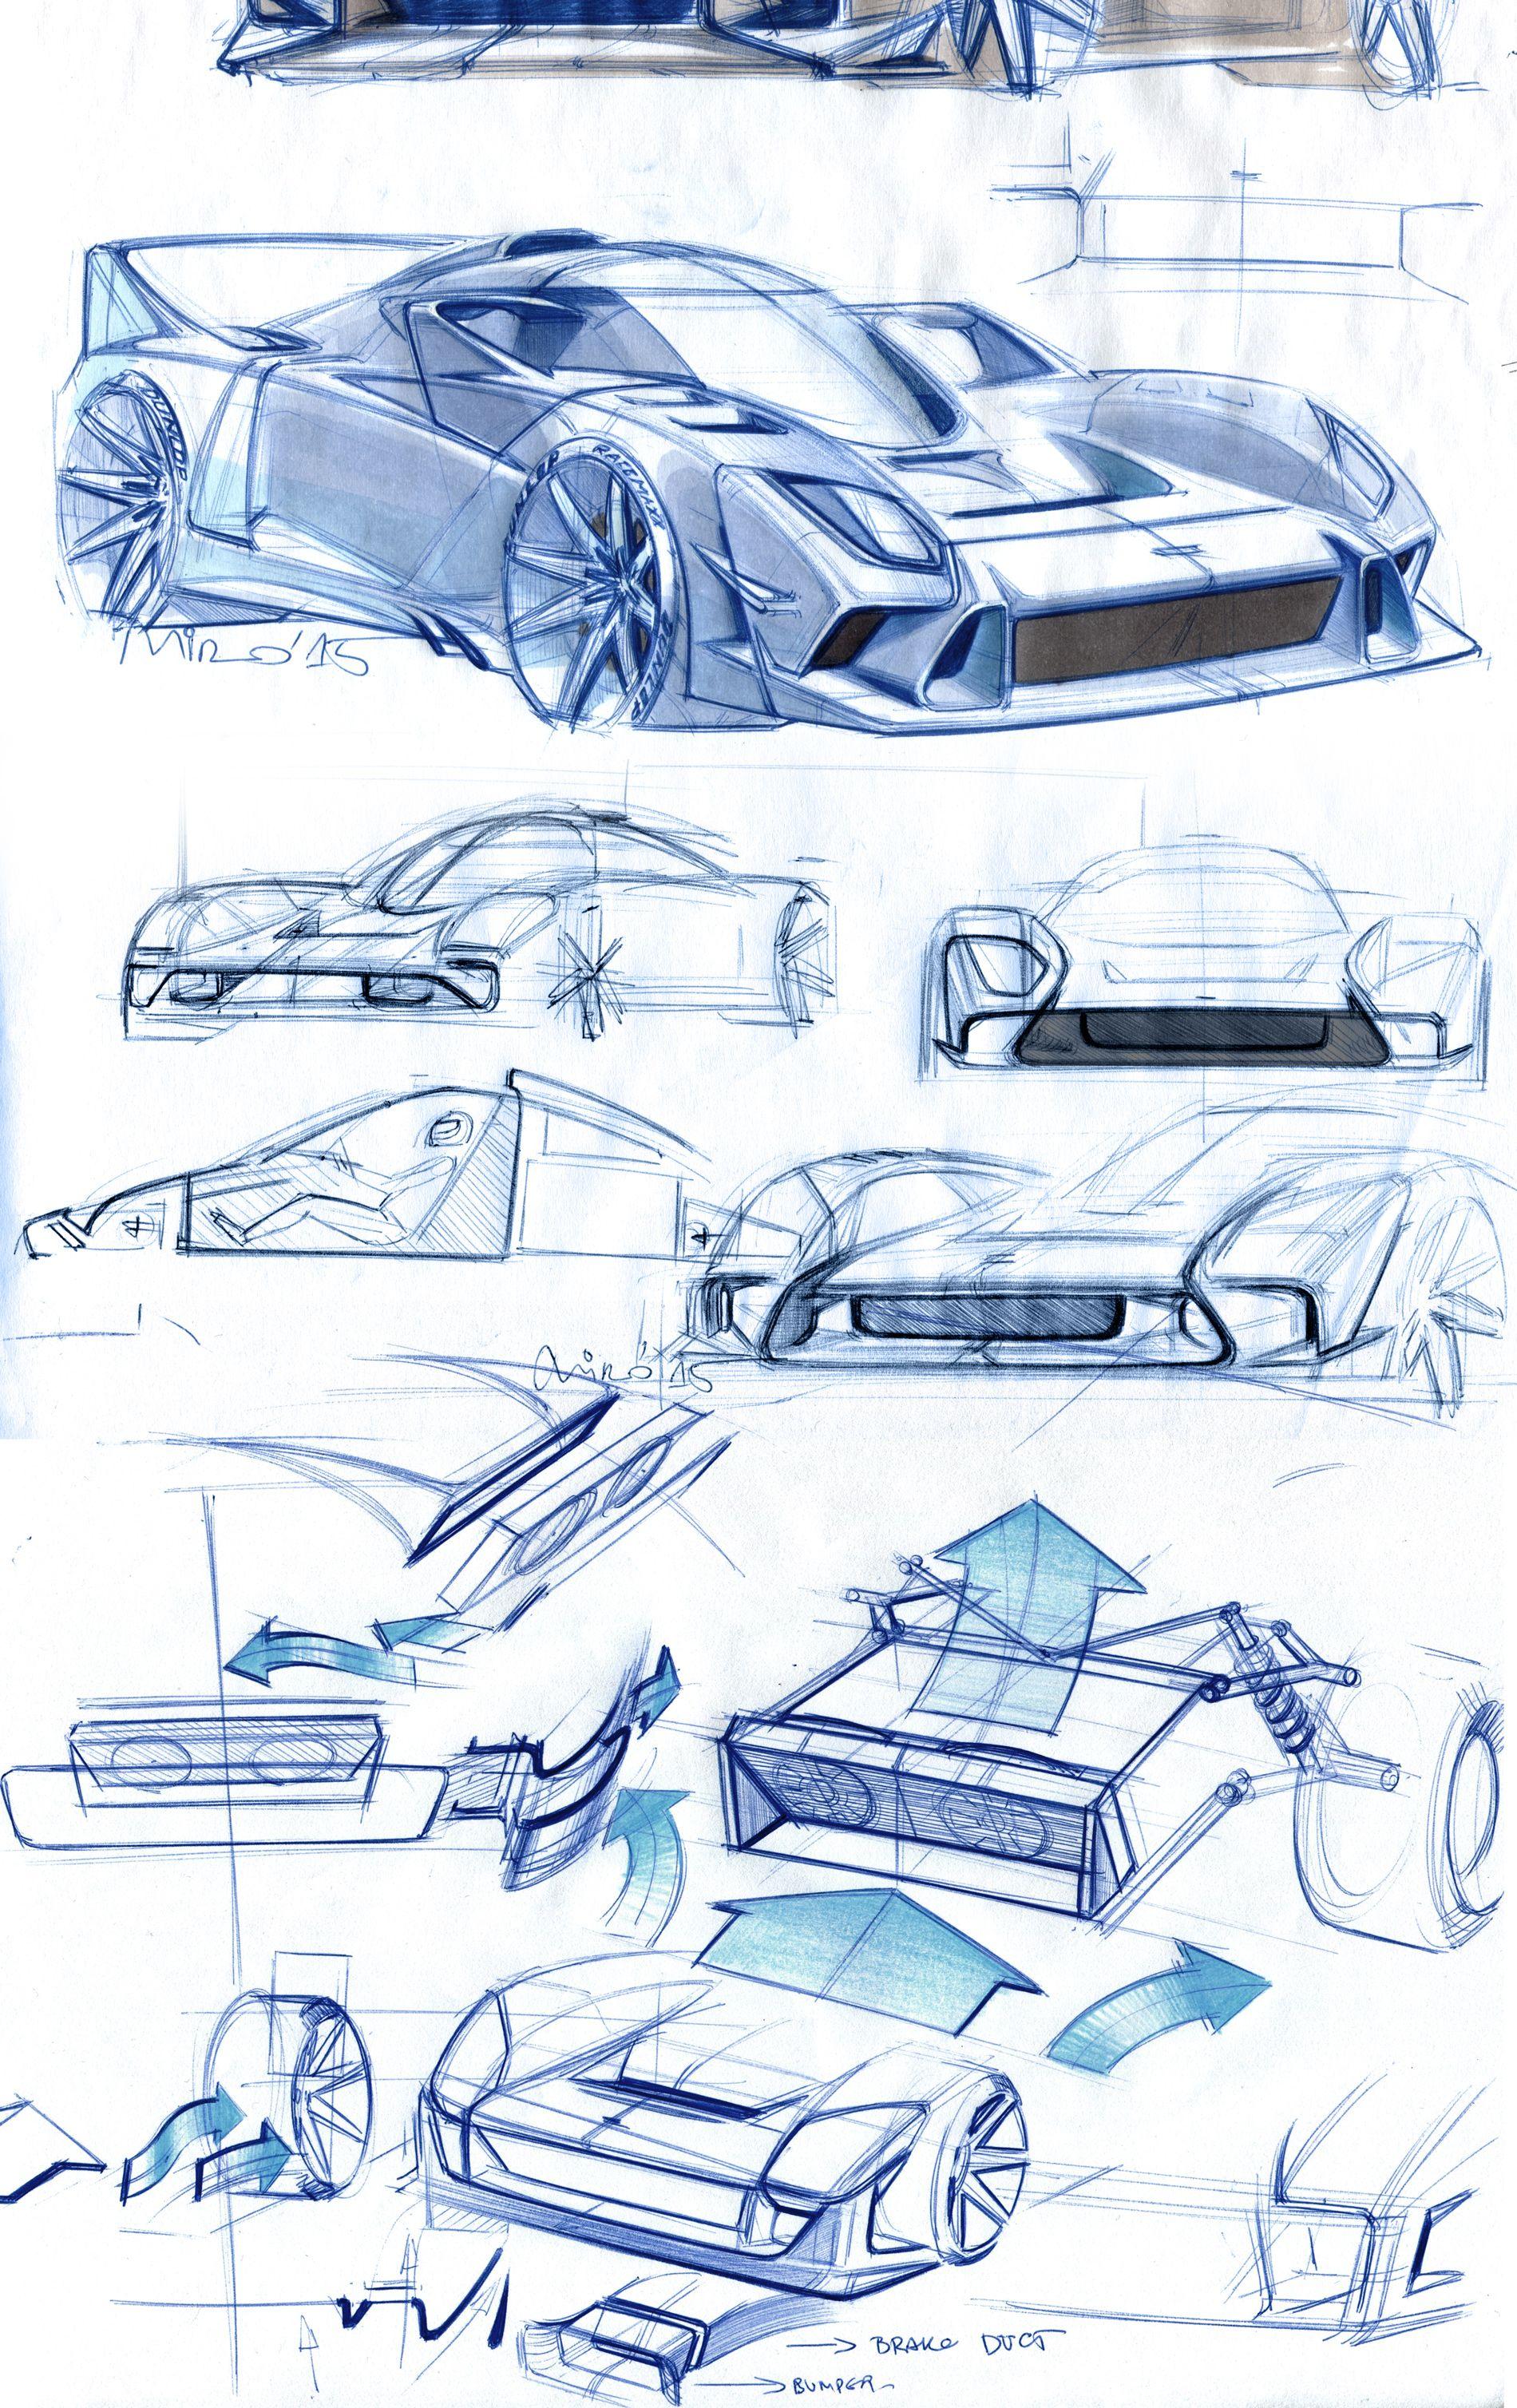 Project Hannibal Nerdy Sketch